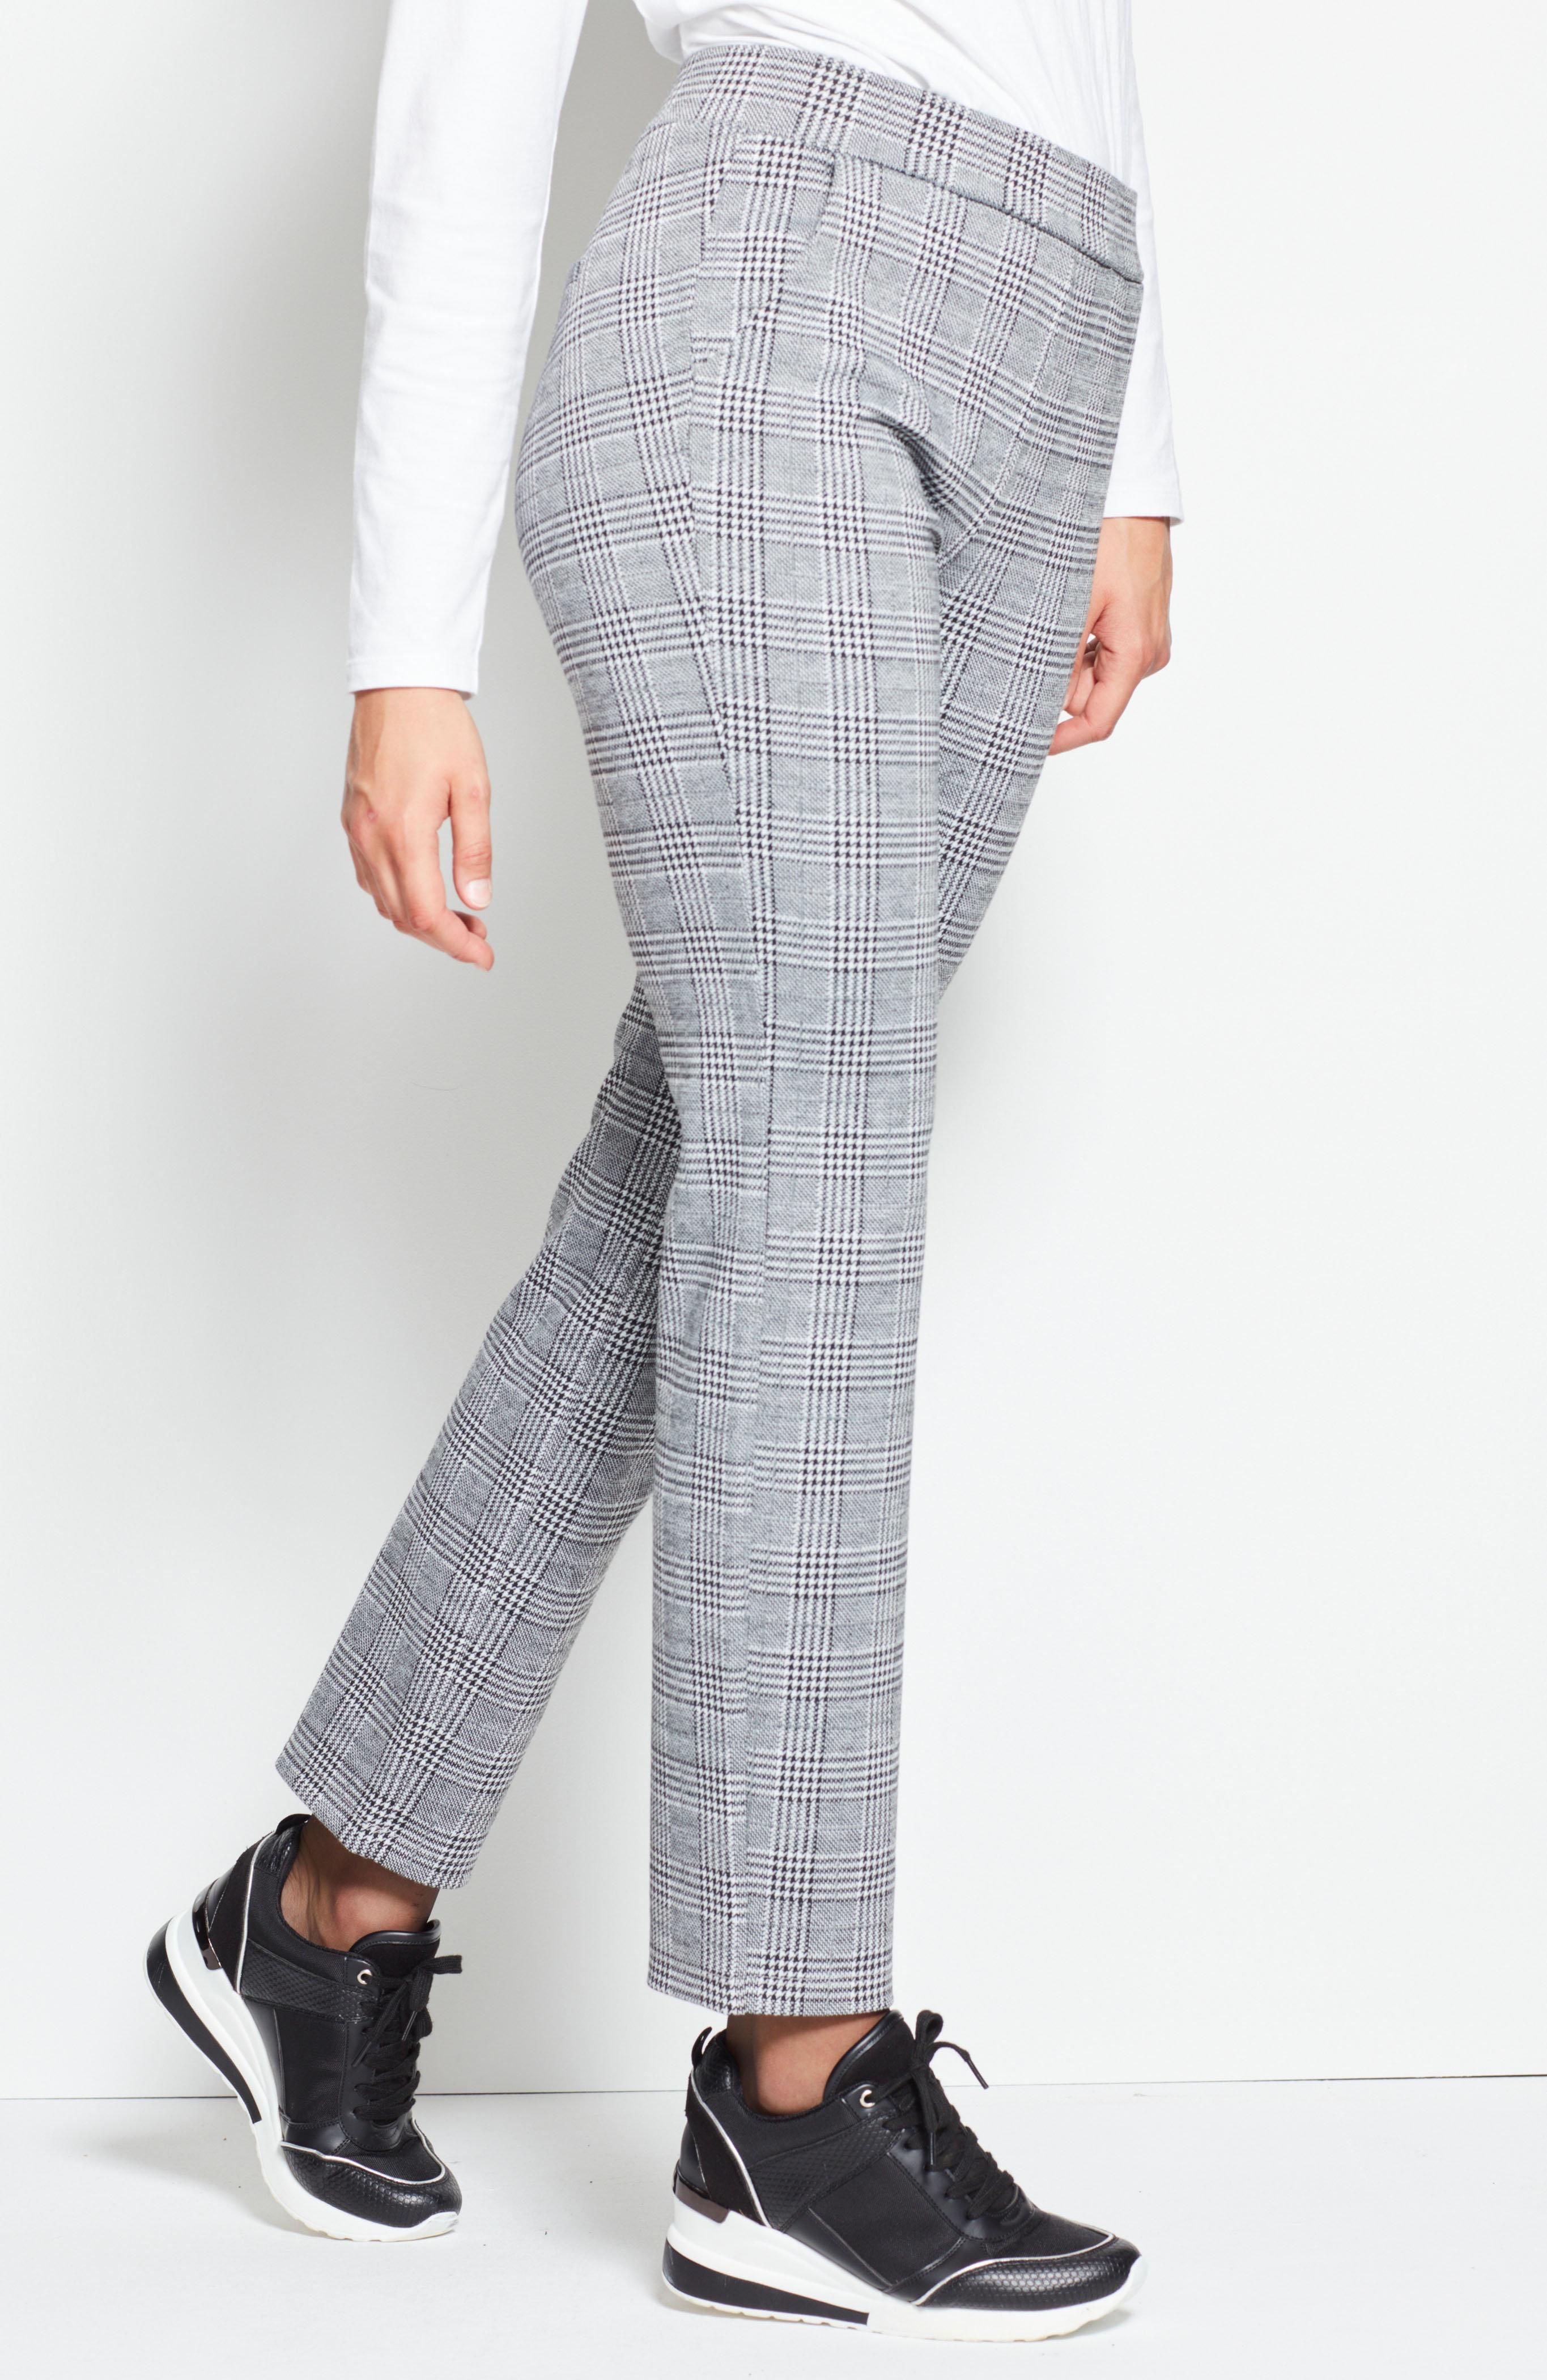 Rūtainas trikotāžas bikses.